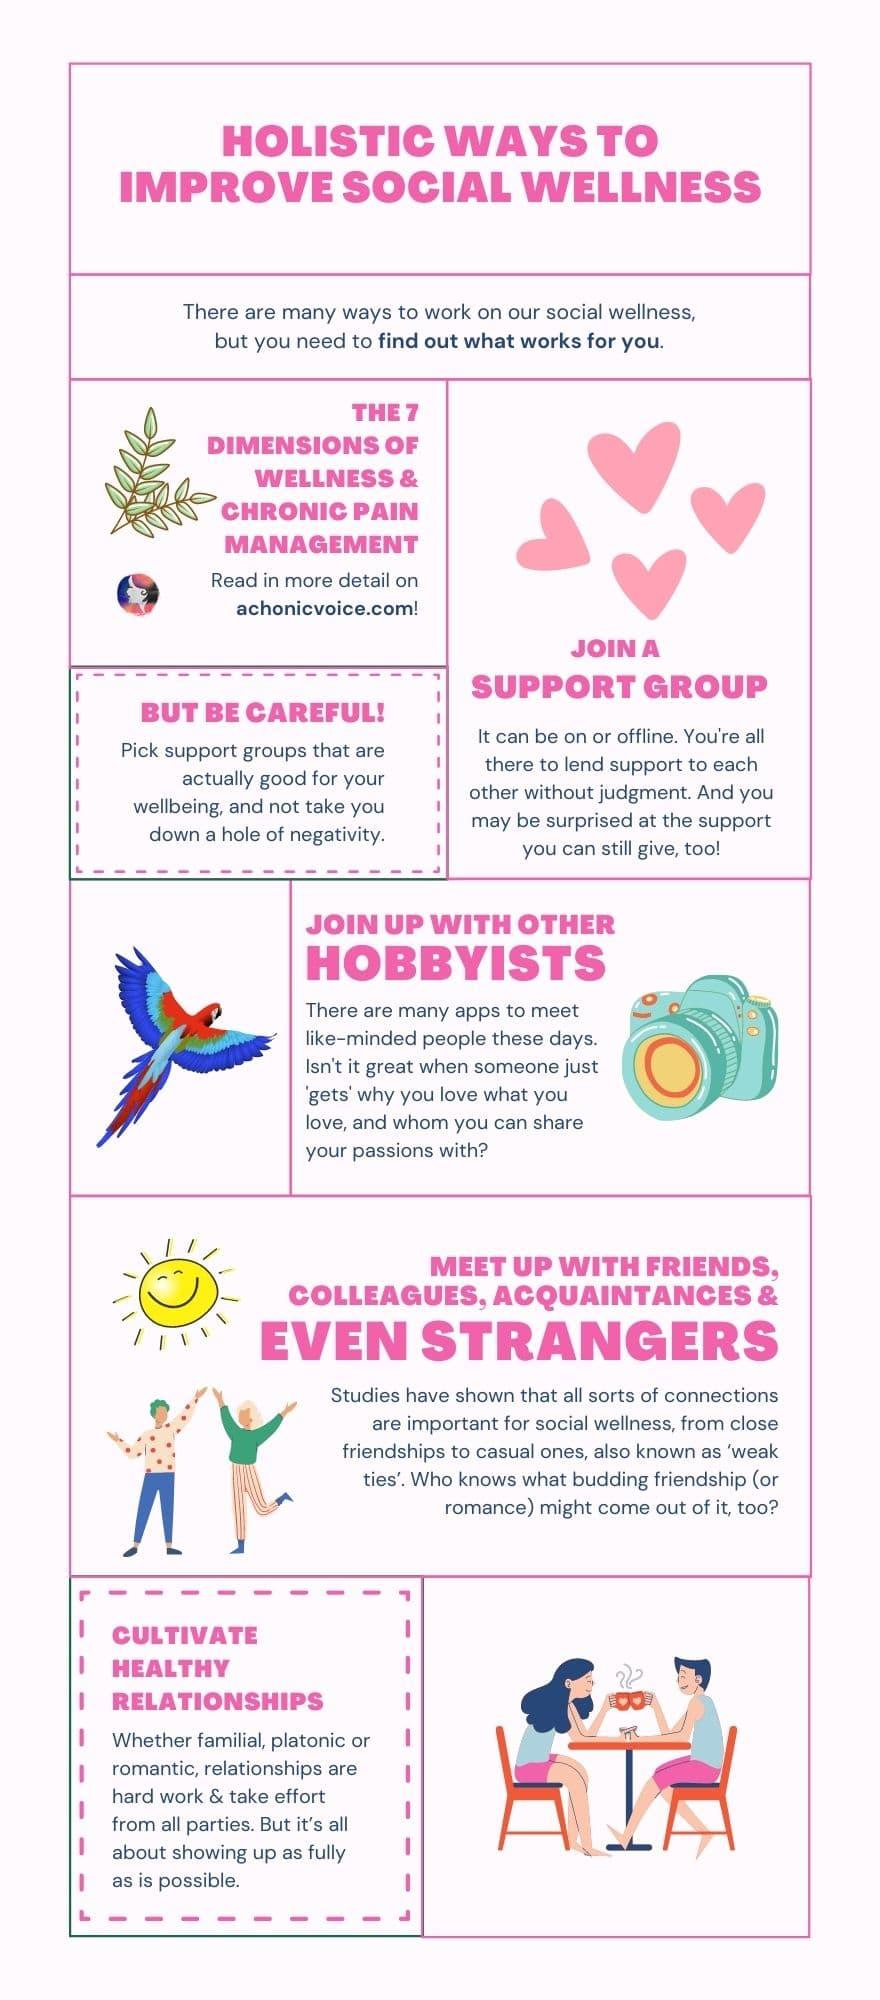 Holistic Ways to Improve Social Wellness - Infographic